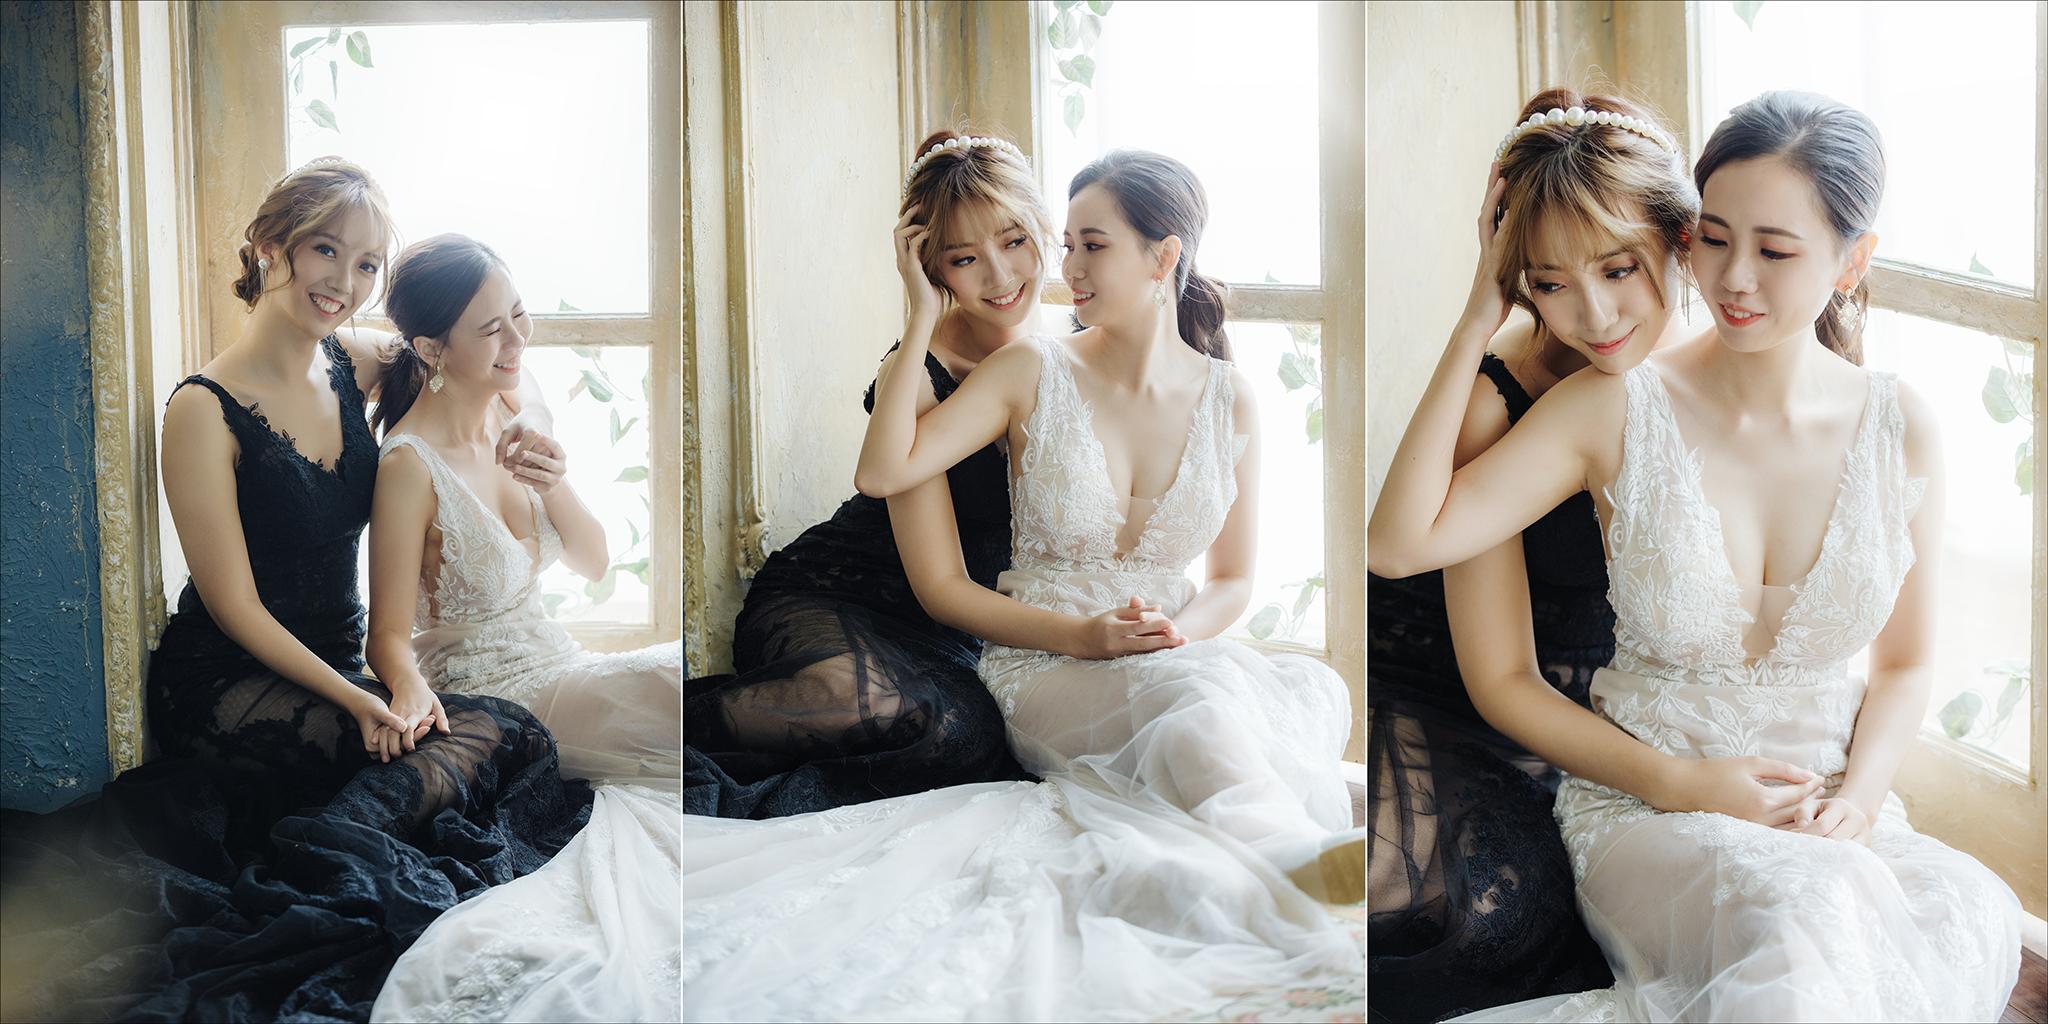 50422973443 203988e211 o - 【閨蜜婚紗】+Cindy&Crystal+